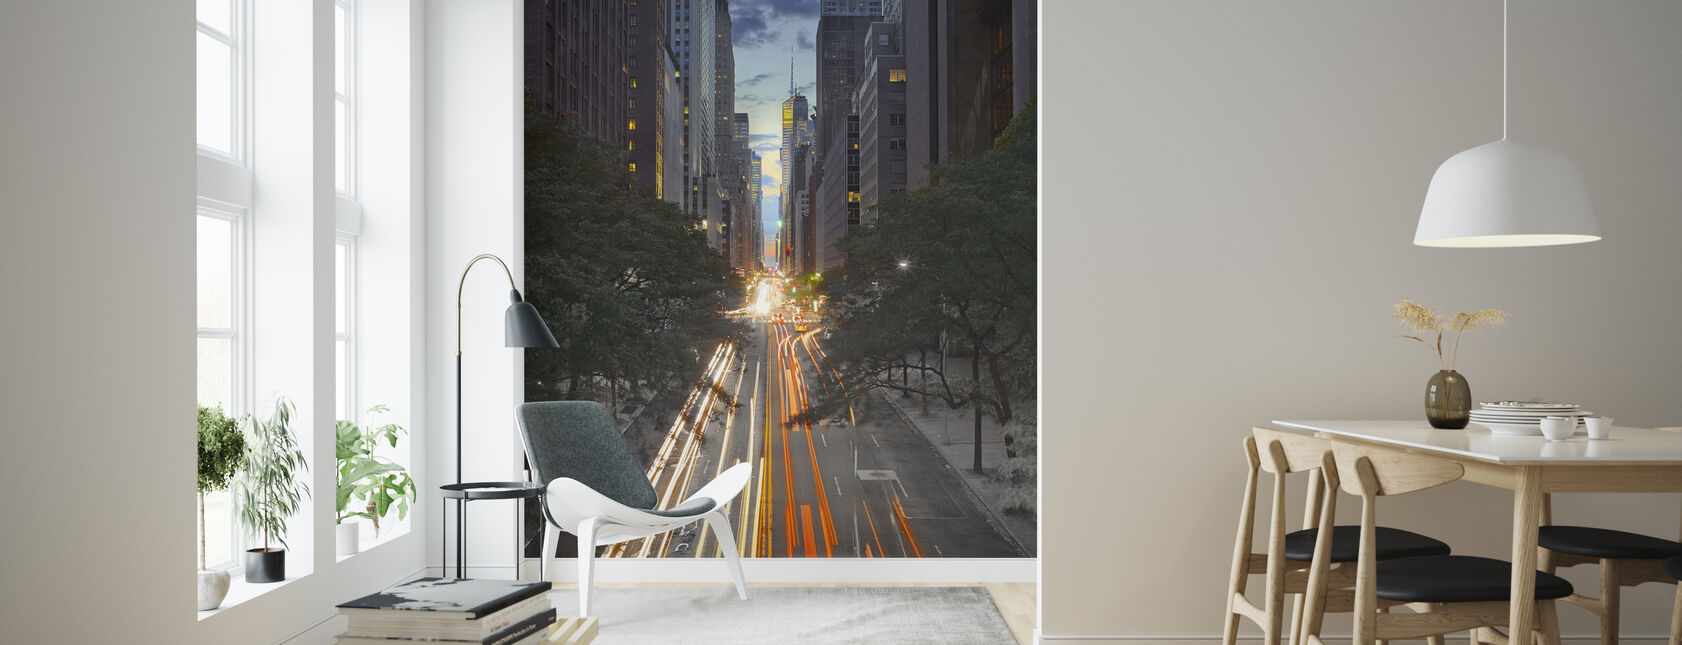 42 St Canyon New York City - Wallpaper - Living Room